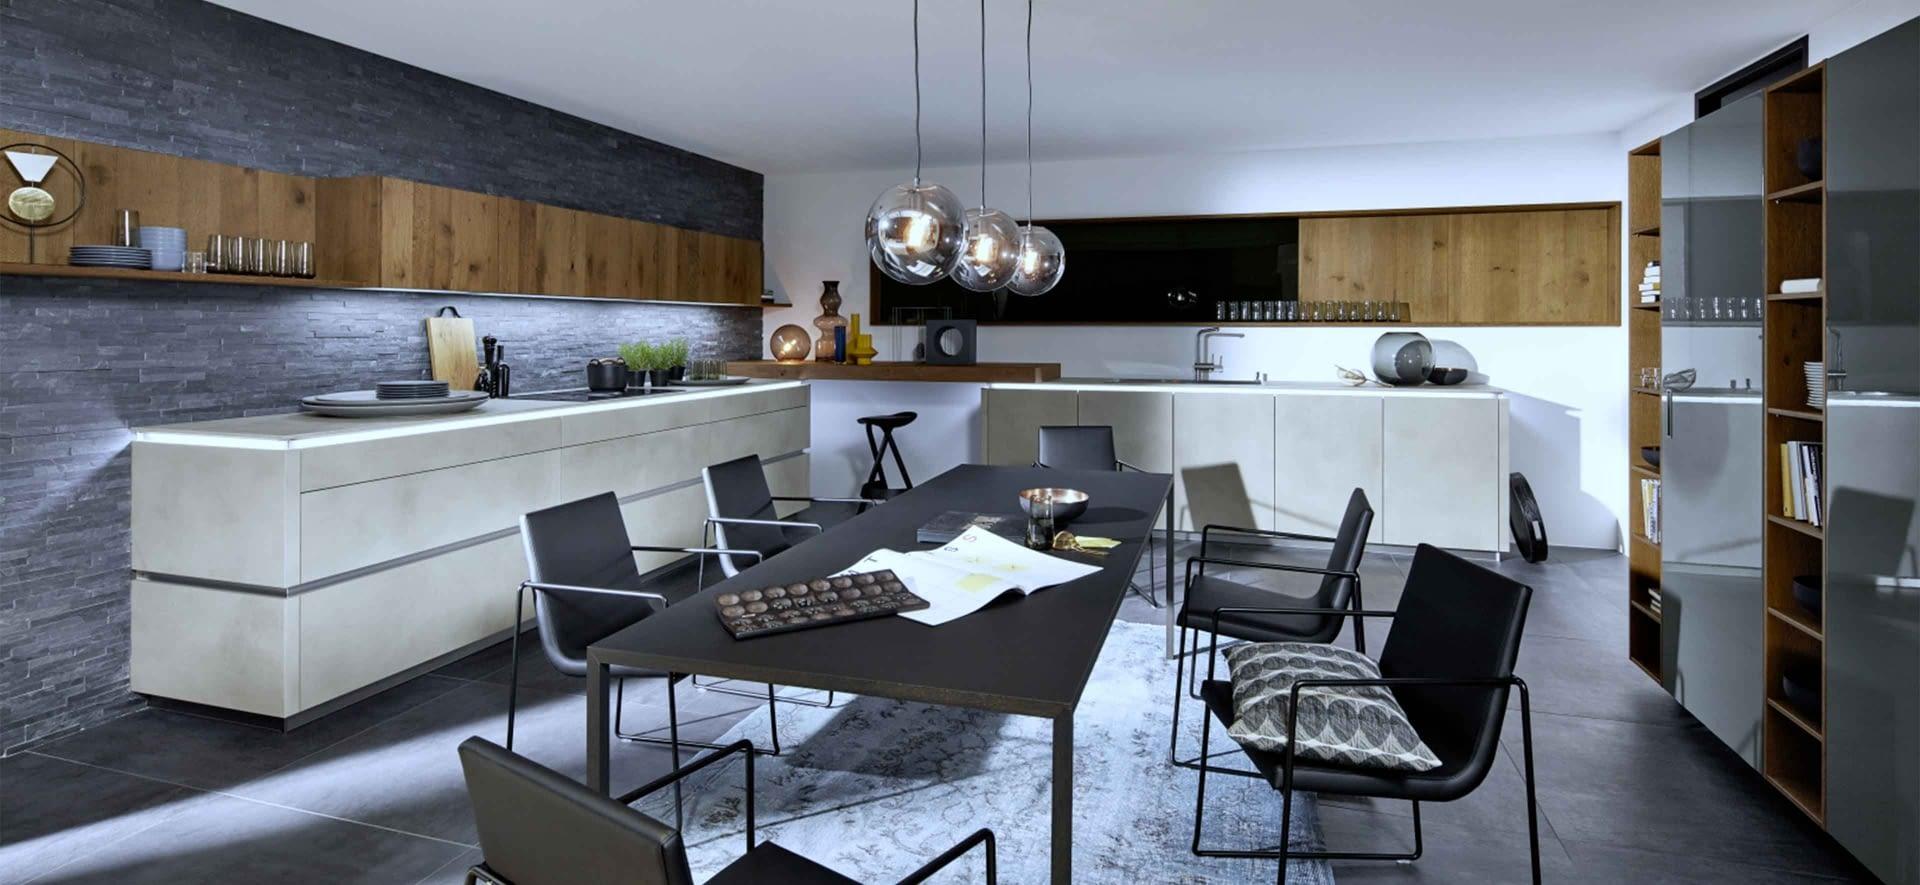 designk che zement achatgrau mit gris molino marquardt k chen. Black Bedroom Furniture Sets. Home Design Ideas